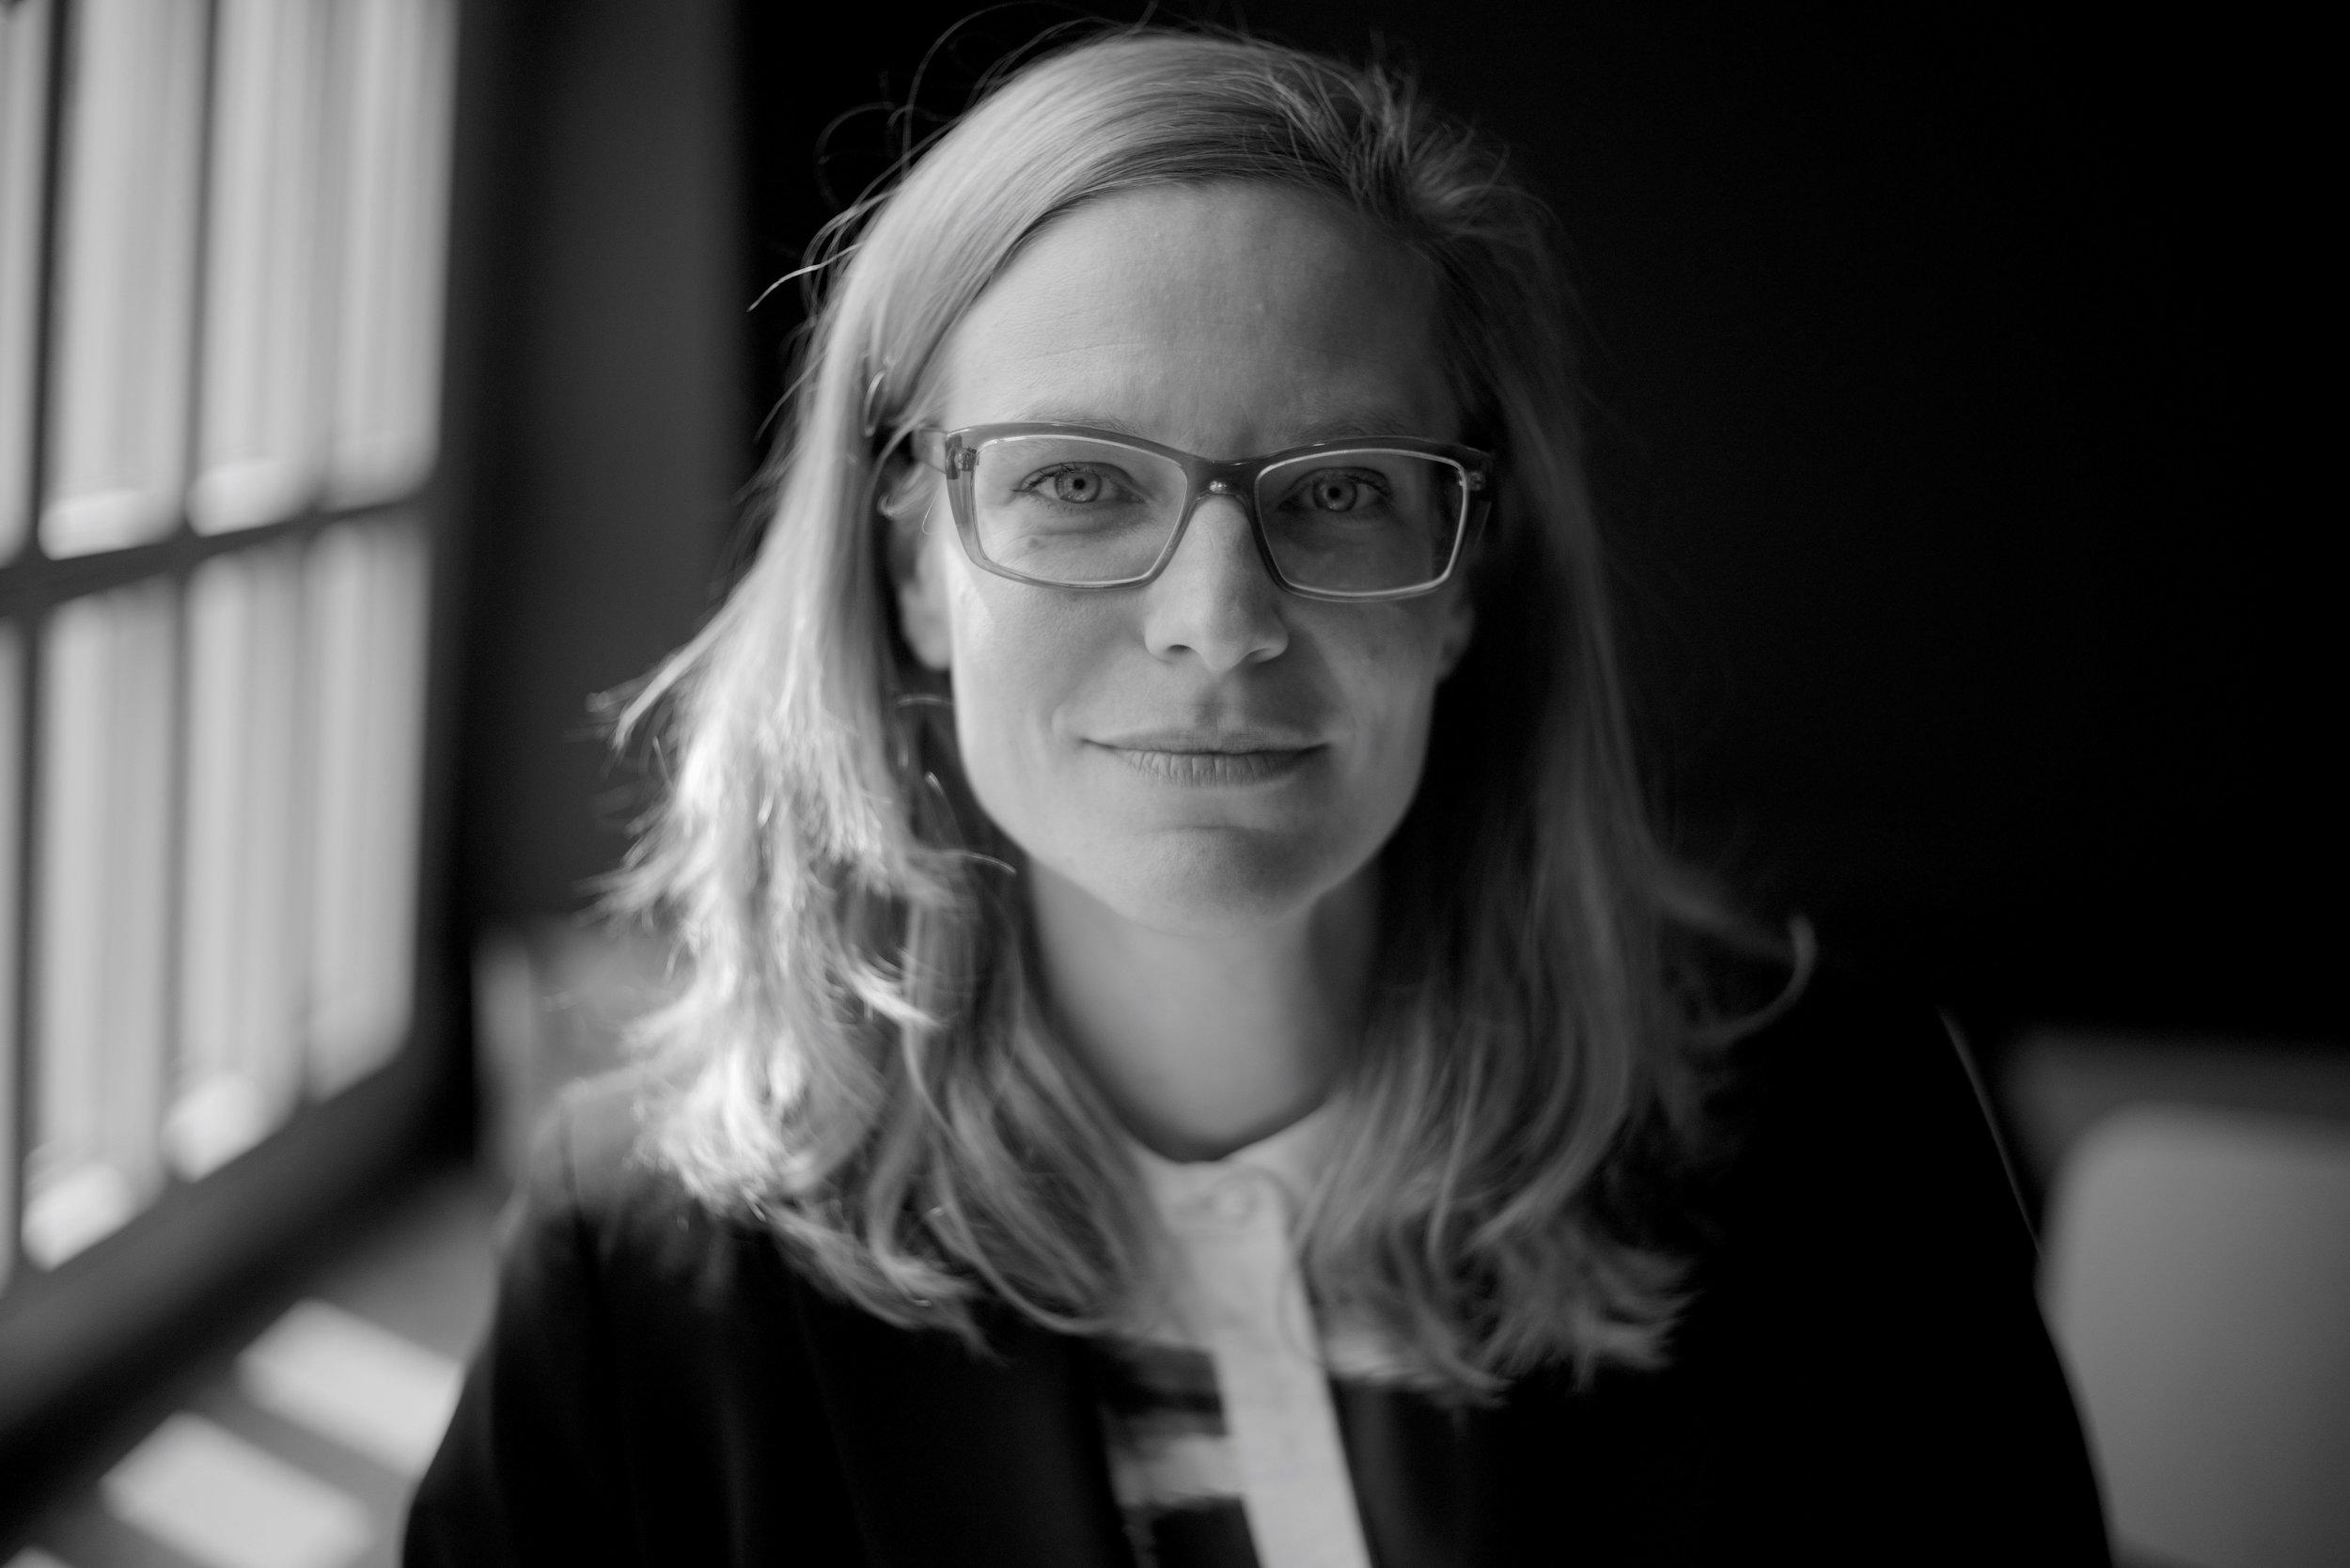 Alexandra Weltz-Rombach - photo by Ralf Ilgenfritz - for use everywhere.jpg